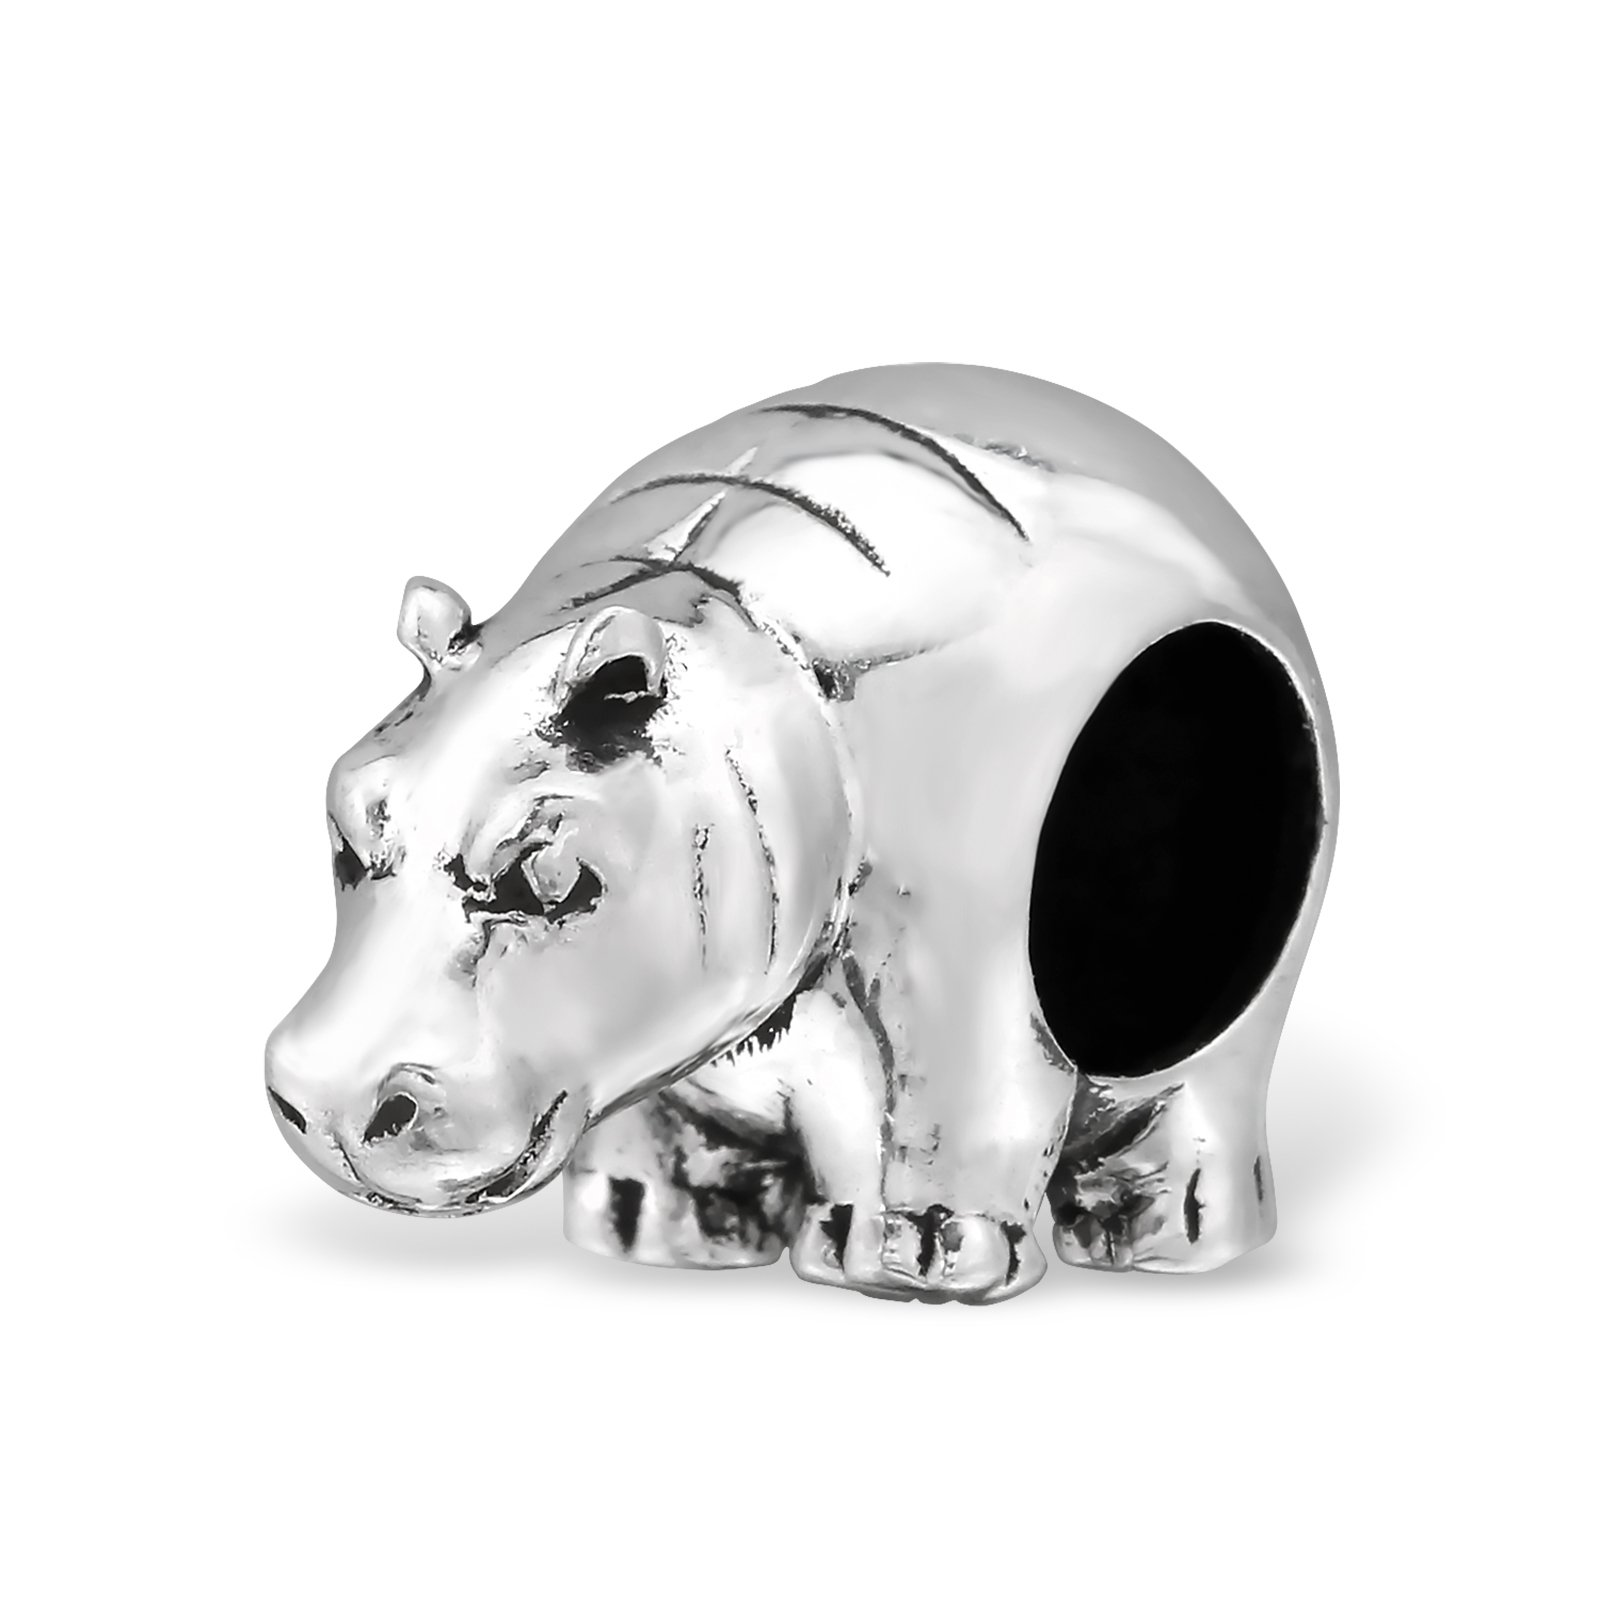 Silvadore – Silver Bead – Hippopotamus Hippo Animal Zoo Farm Creature Wild – 925 Sterling Charm 3D Slide On 735658 – Fits Pandora European Bracelet – Free Gift Boxed